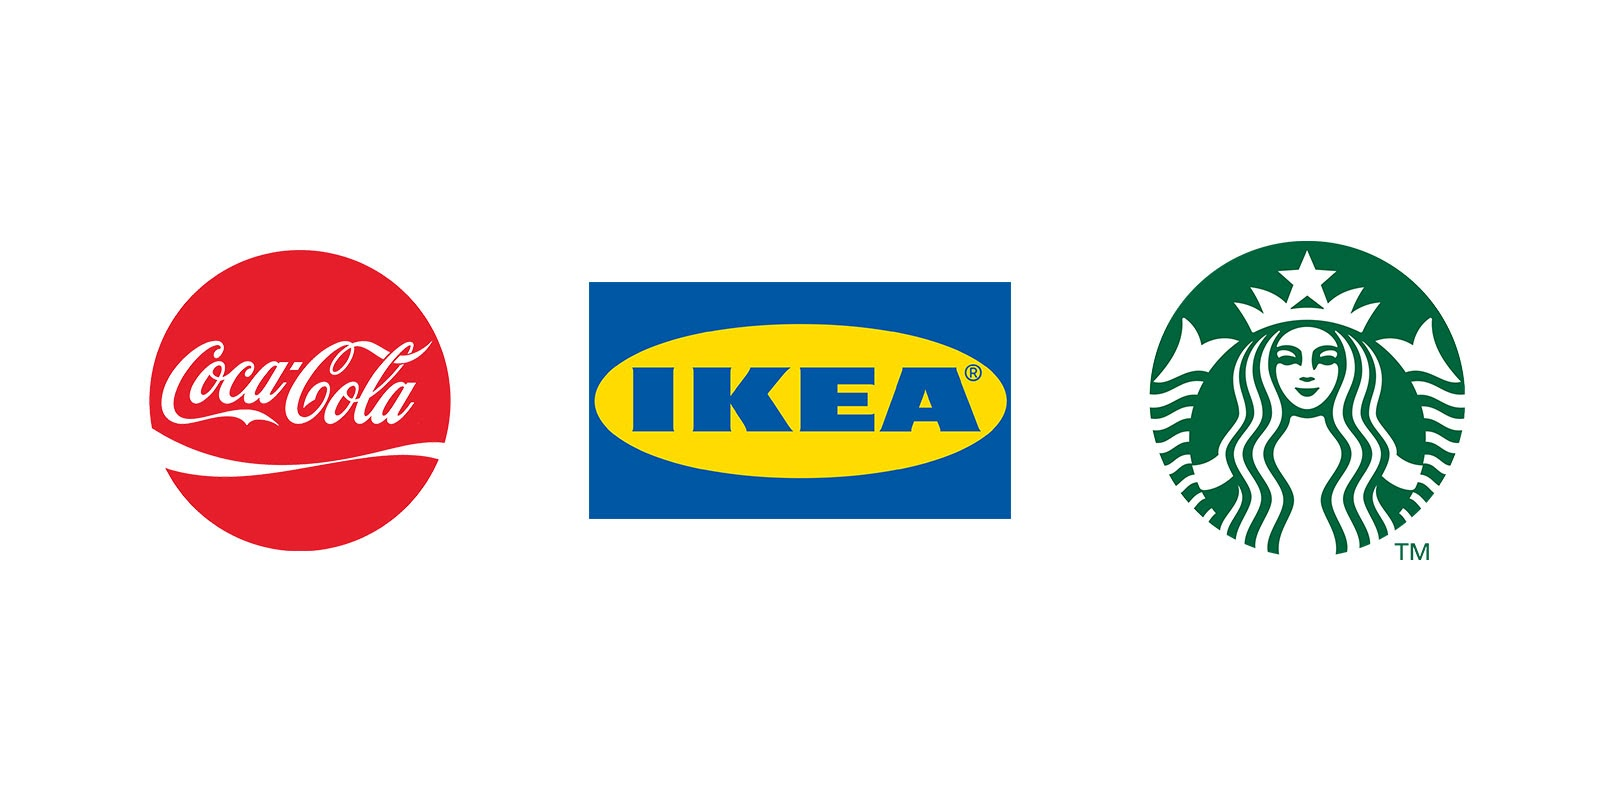 Coca-Cola, Ikea, and Starbucks have recognizable brand colors